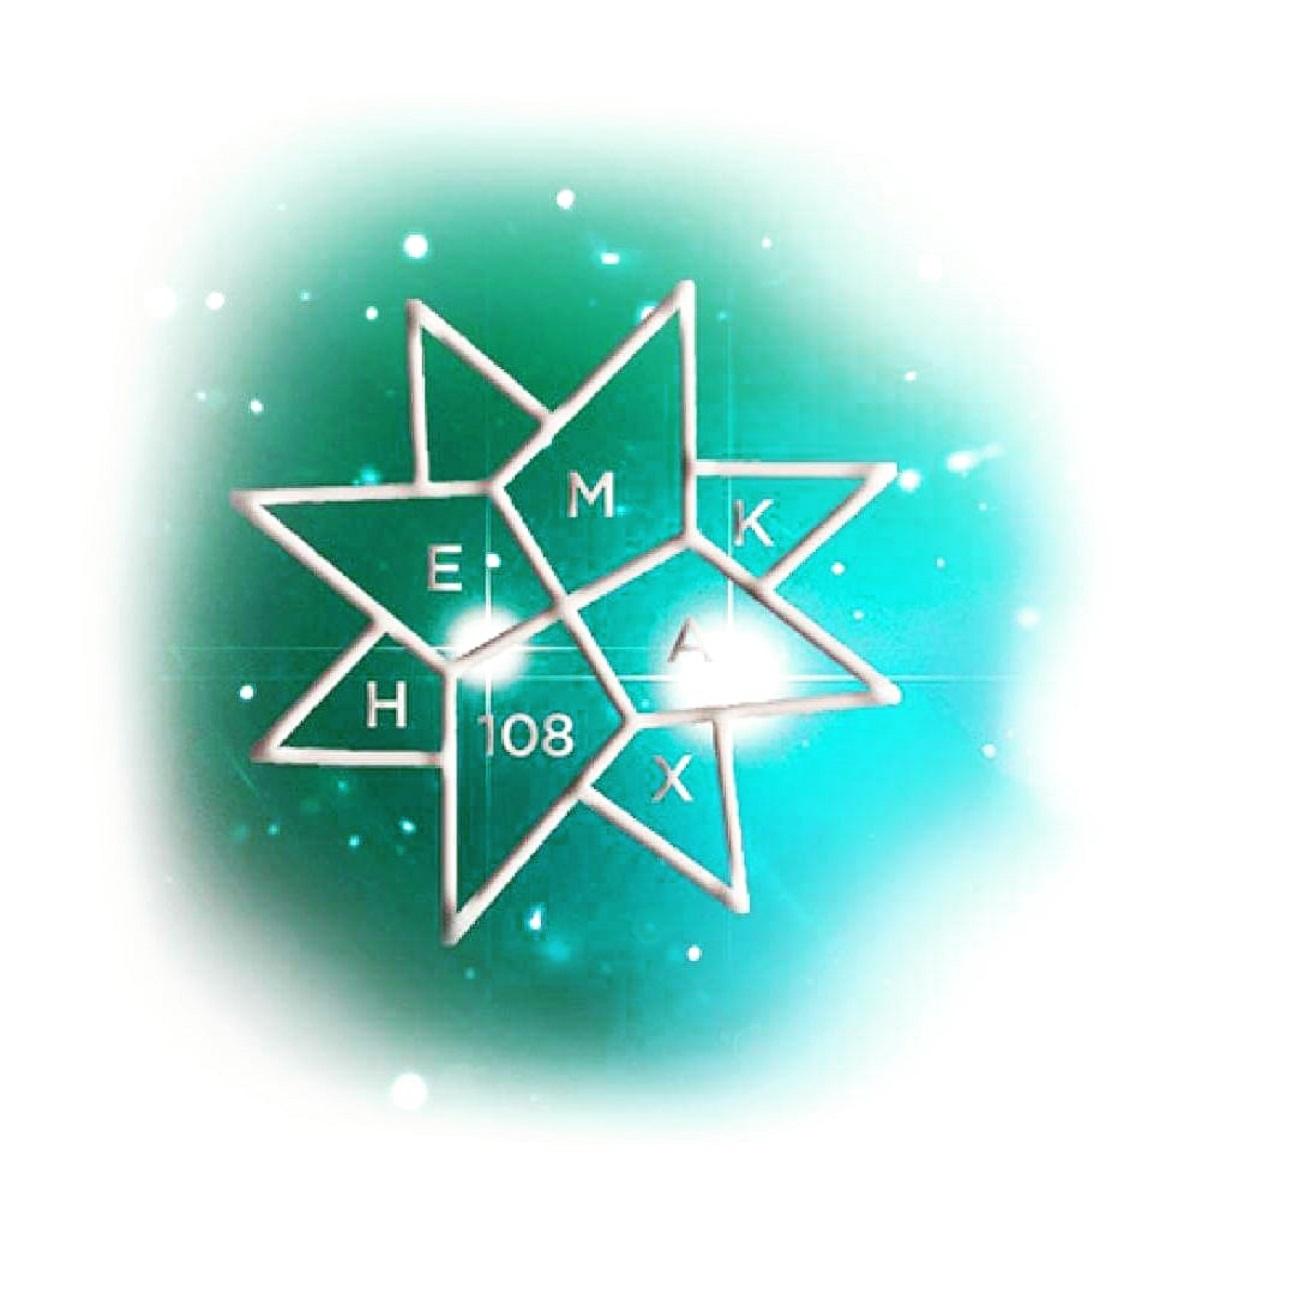 Turma Nova do Curso de Mesa Cósmica Estelar